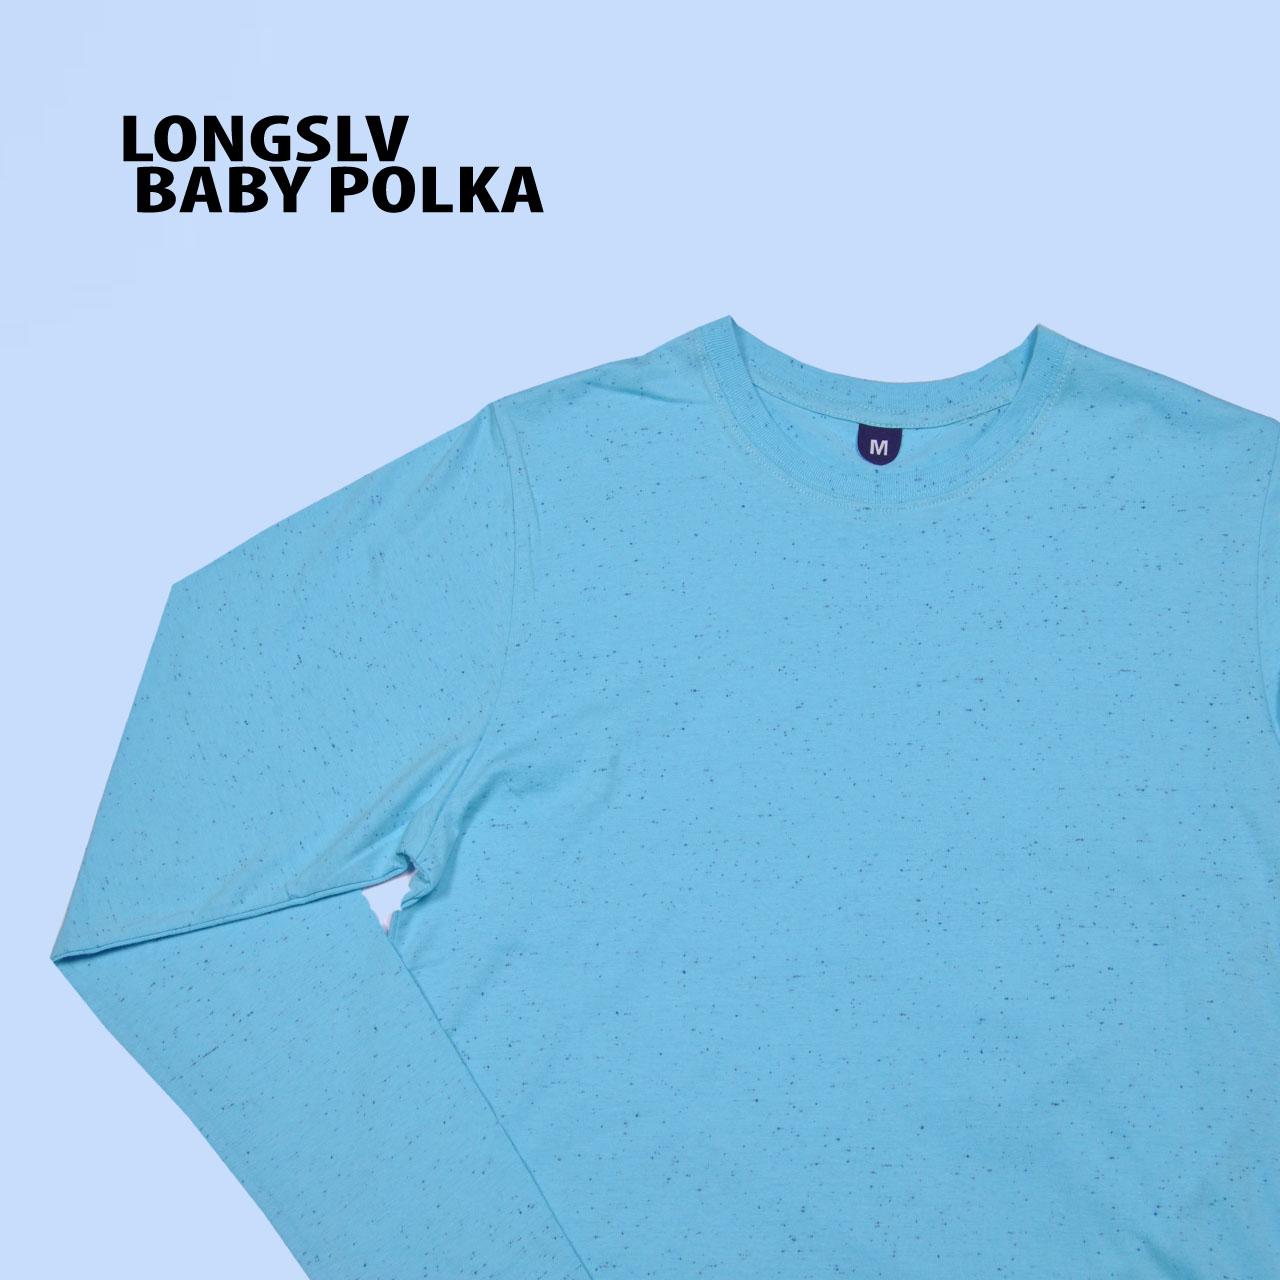 Kaos Polos Bdg 69 Shop Line Twotone Navy Blue Longsleeve Baby Polka Unisex